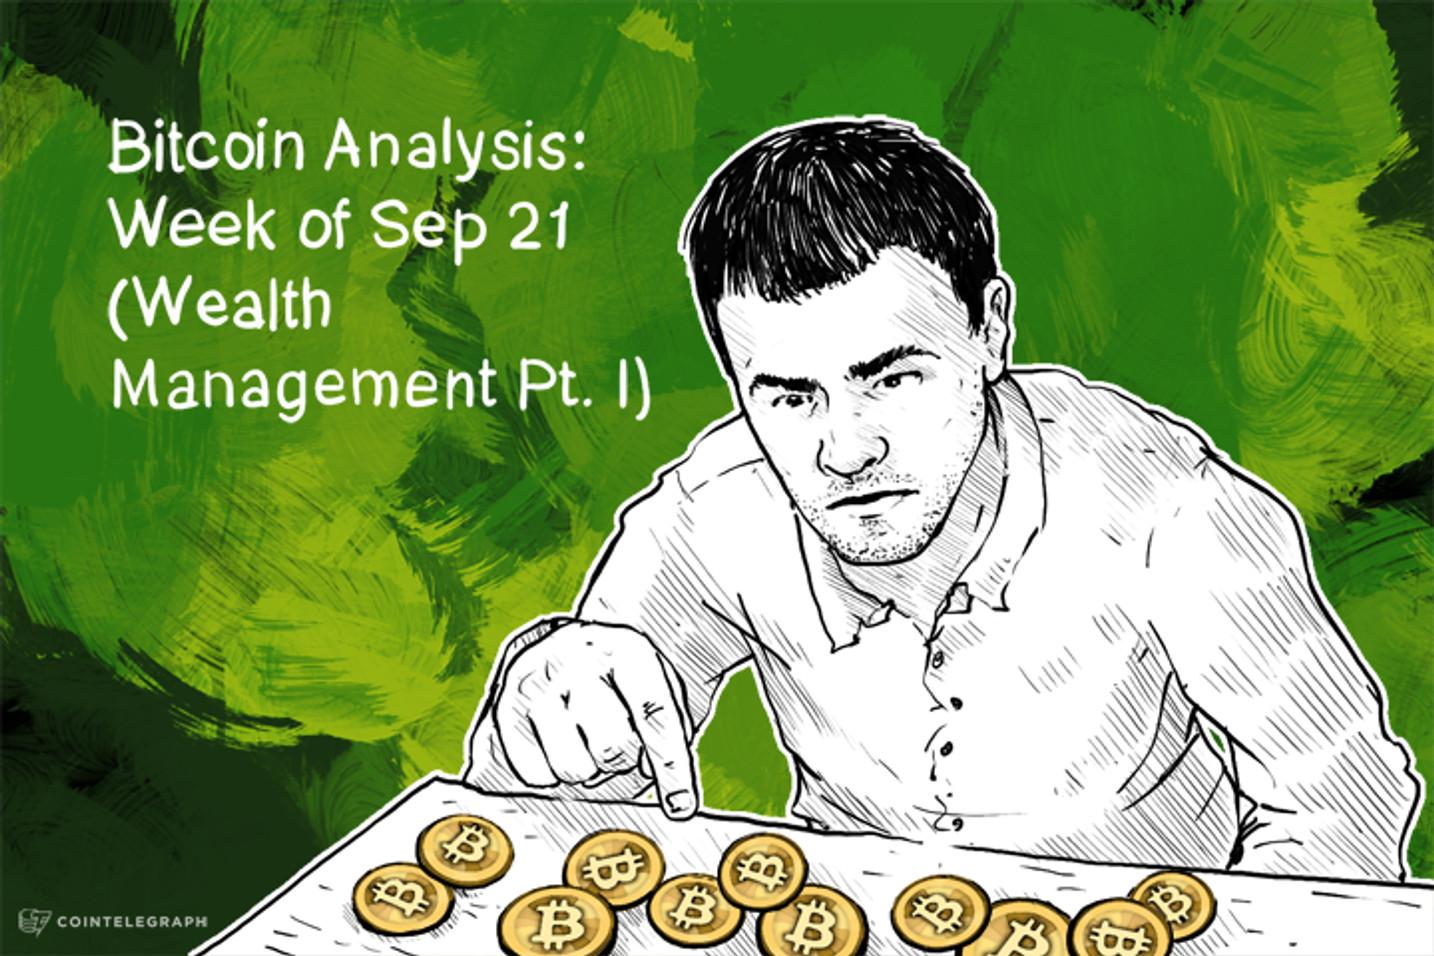 Bitcoin Analysis: Week of Sep 21 (Wealth Management Pt. I)